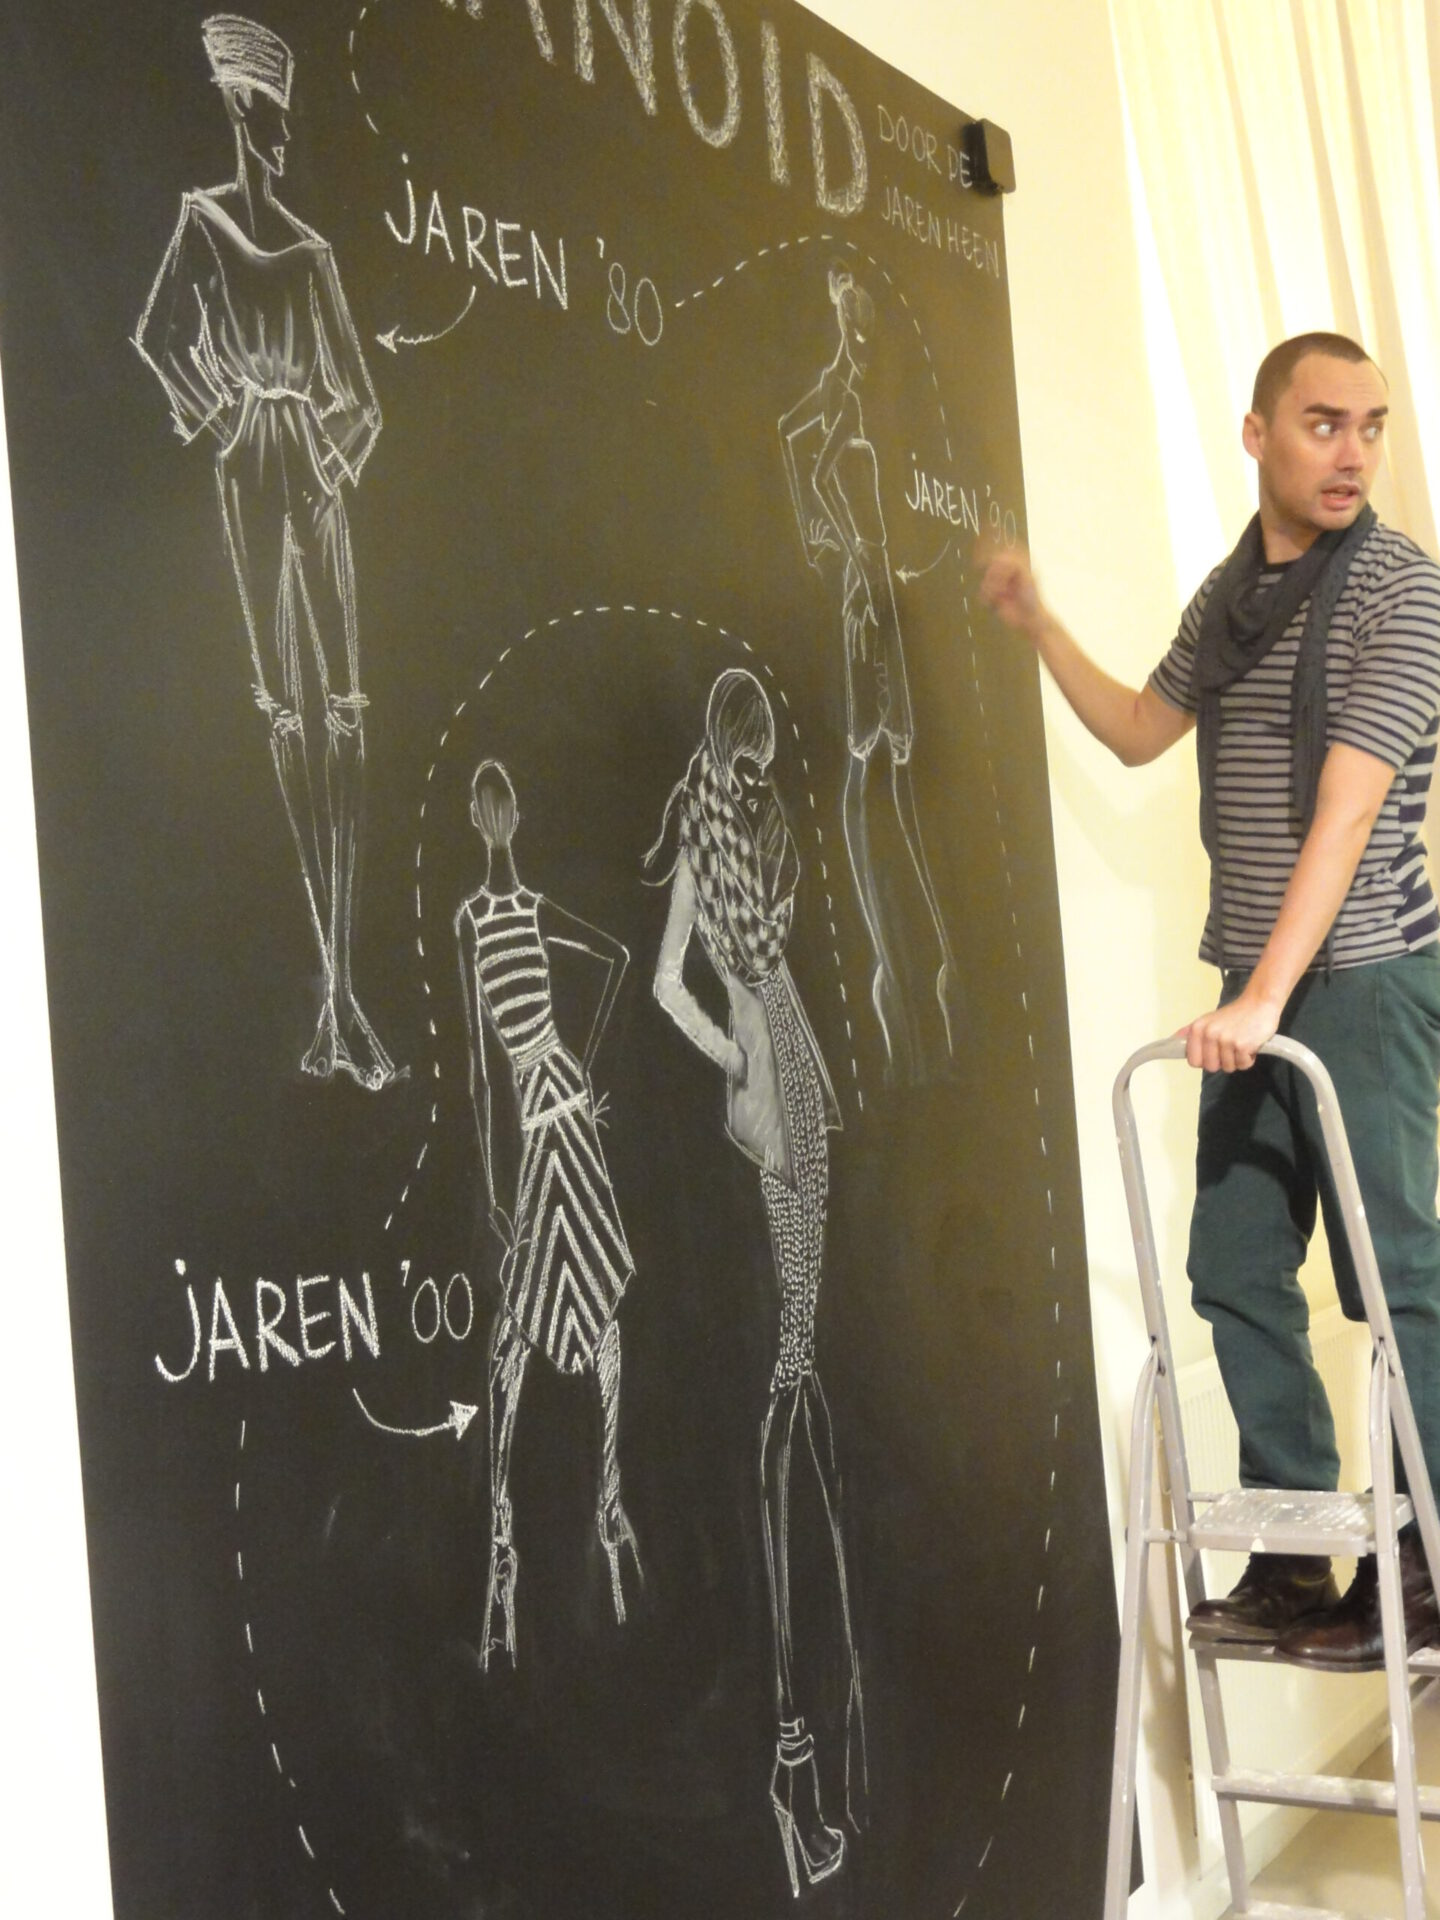 Mural Art Mural Art Humanoid Store Arnhem Joey Holthaus